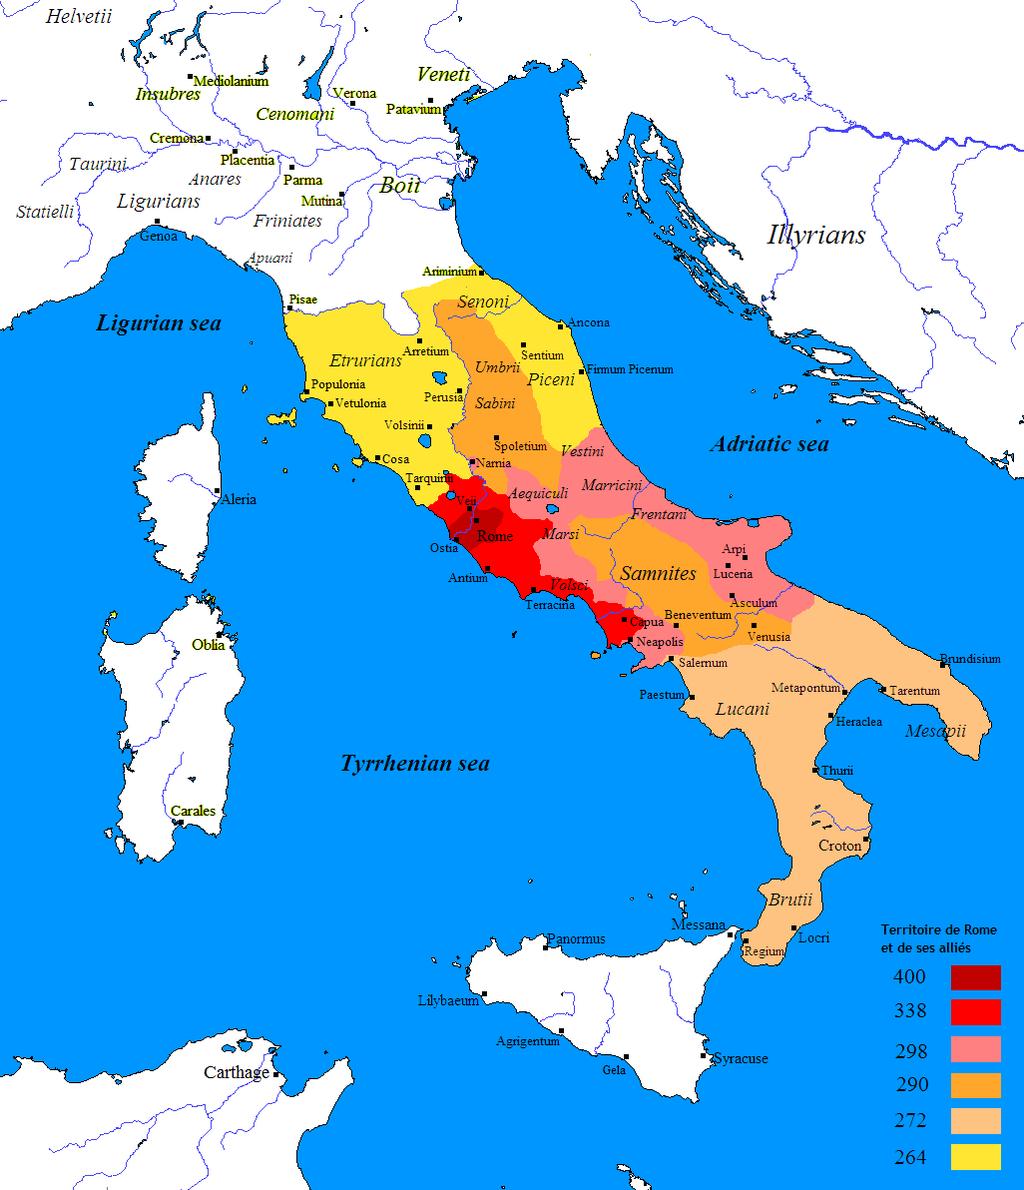 Conquête romaine de l'Italie (400-264)